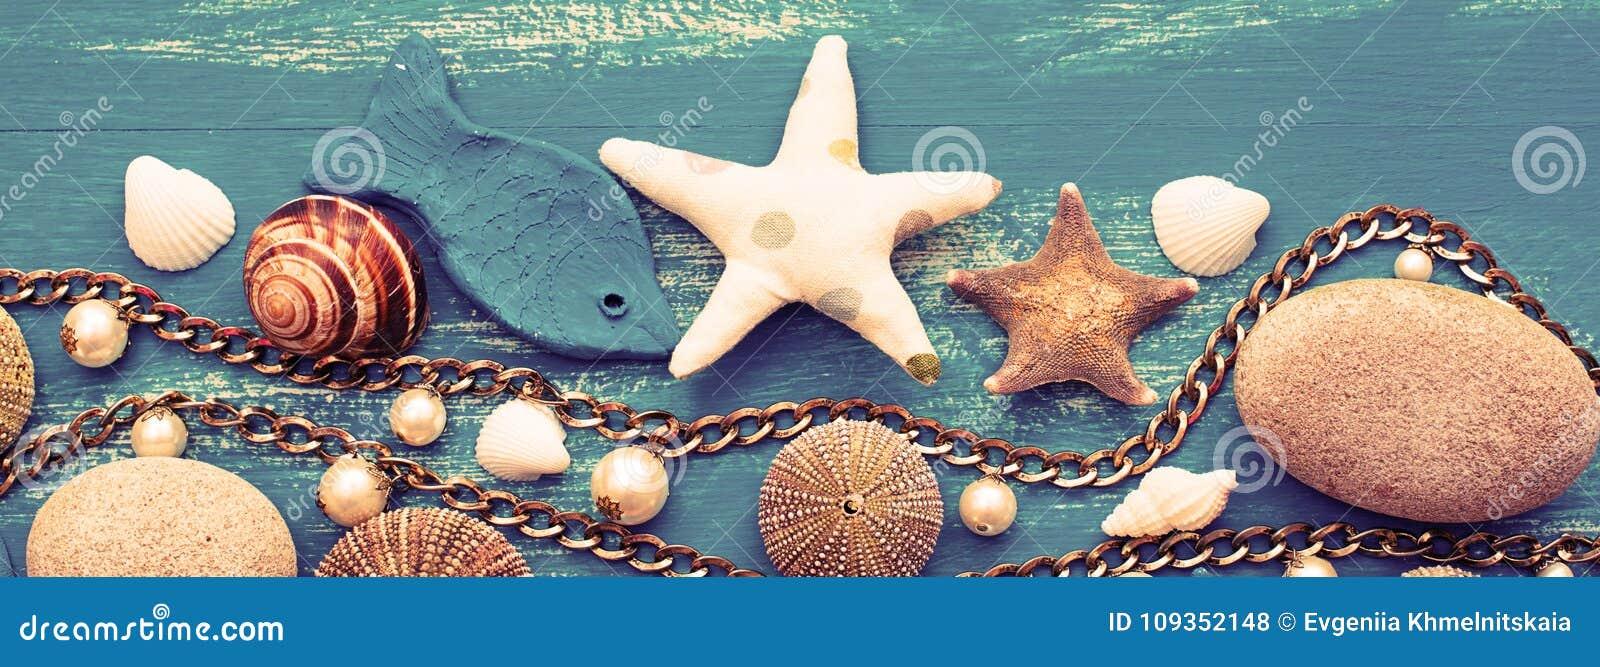 Banner Decorative arrangement of sea shells and stones